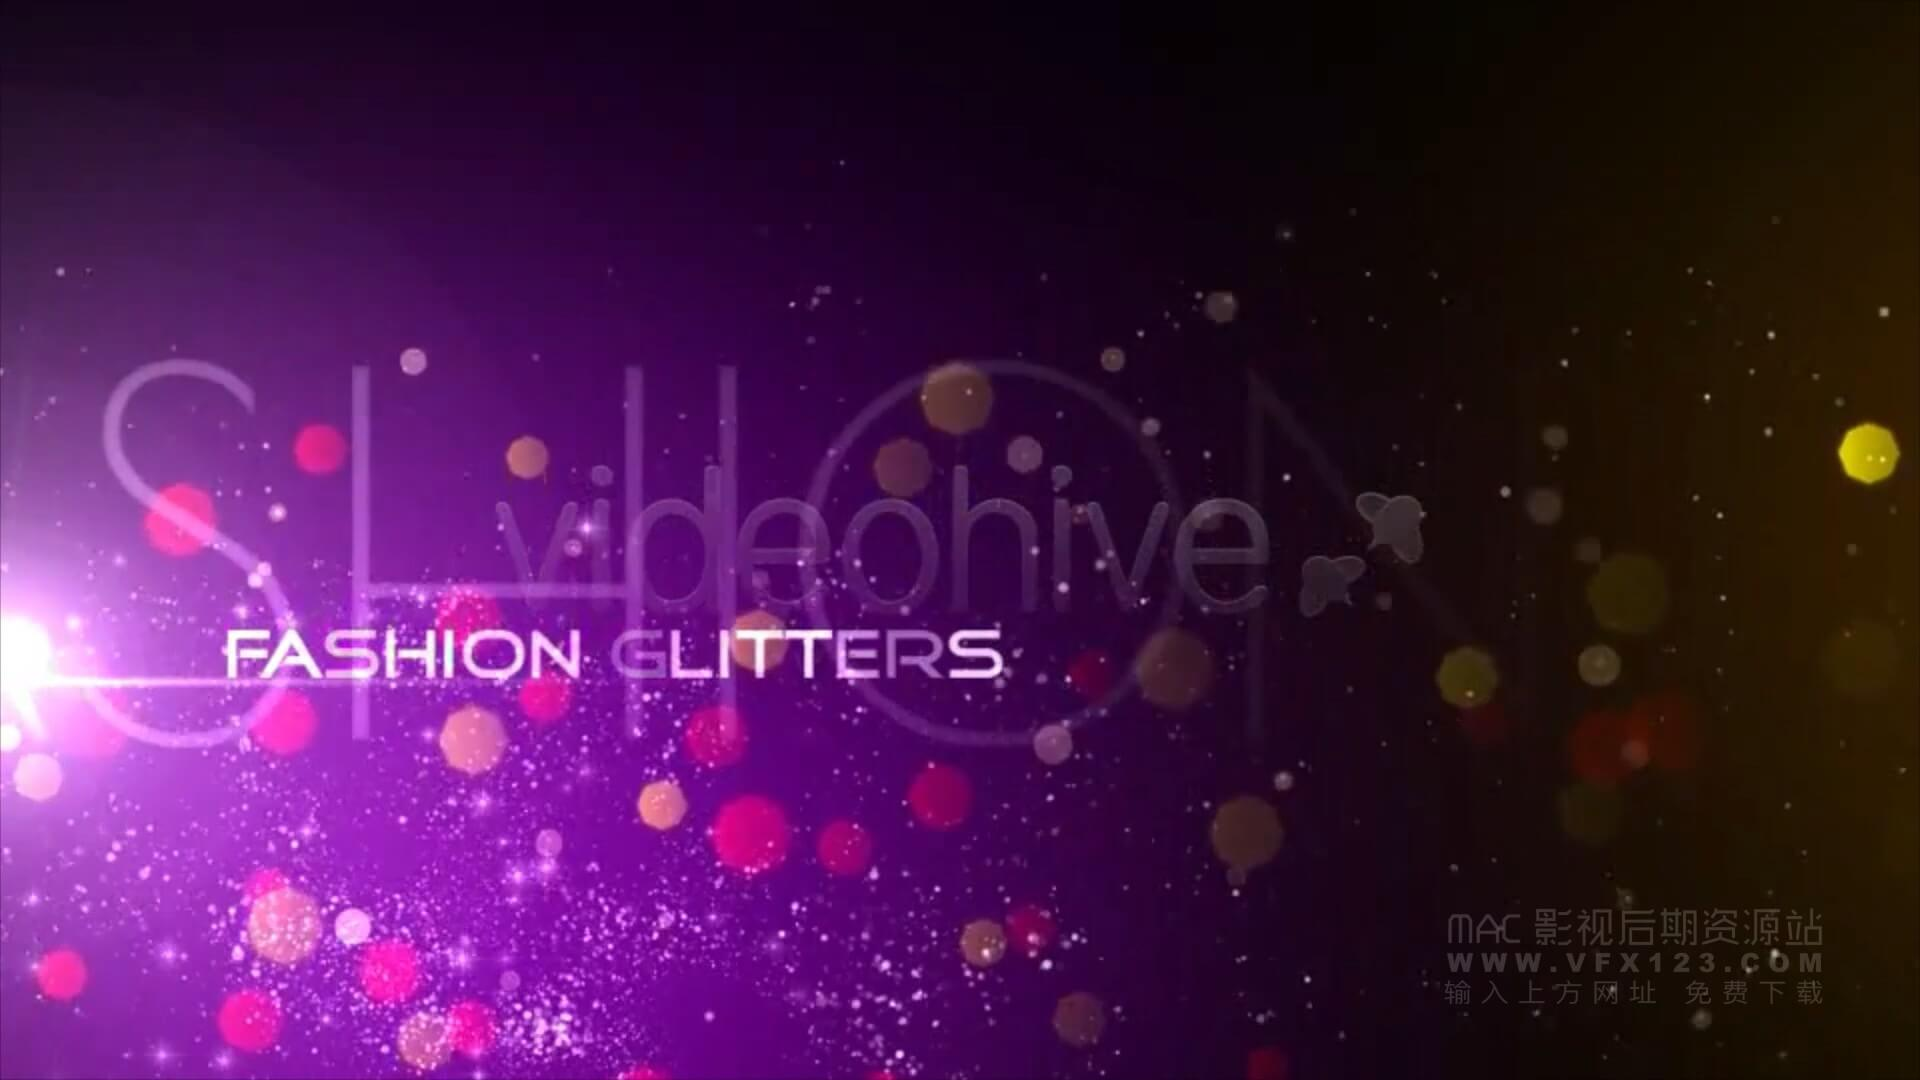 Motion模板 颁奖典礼时尚婚礼开场粒子飞扬视频展示 Fashion Glitters